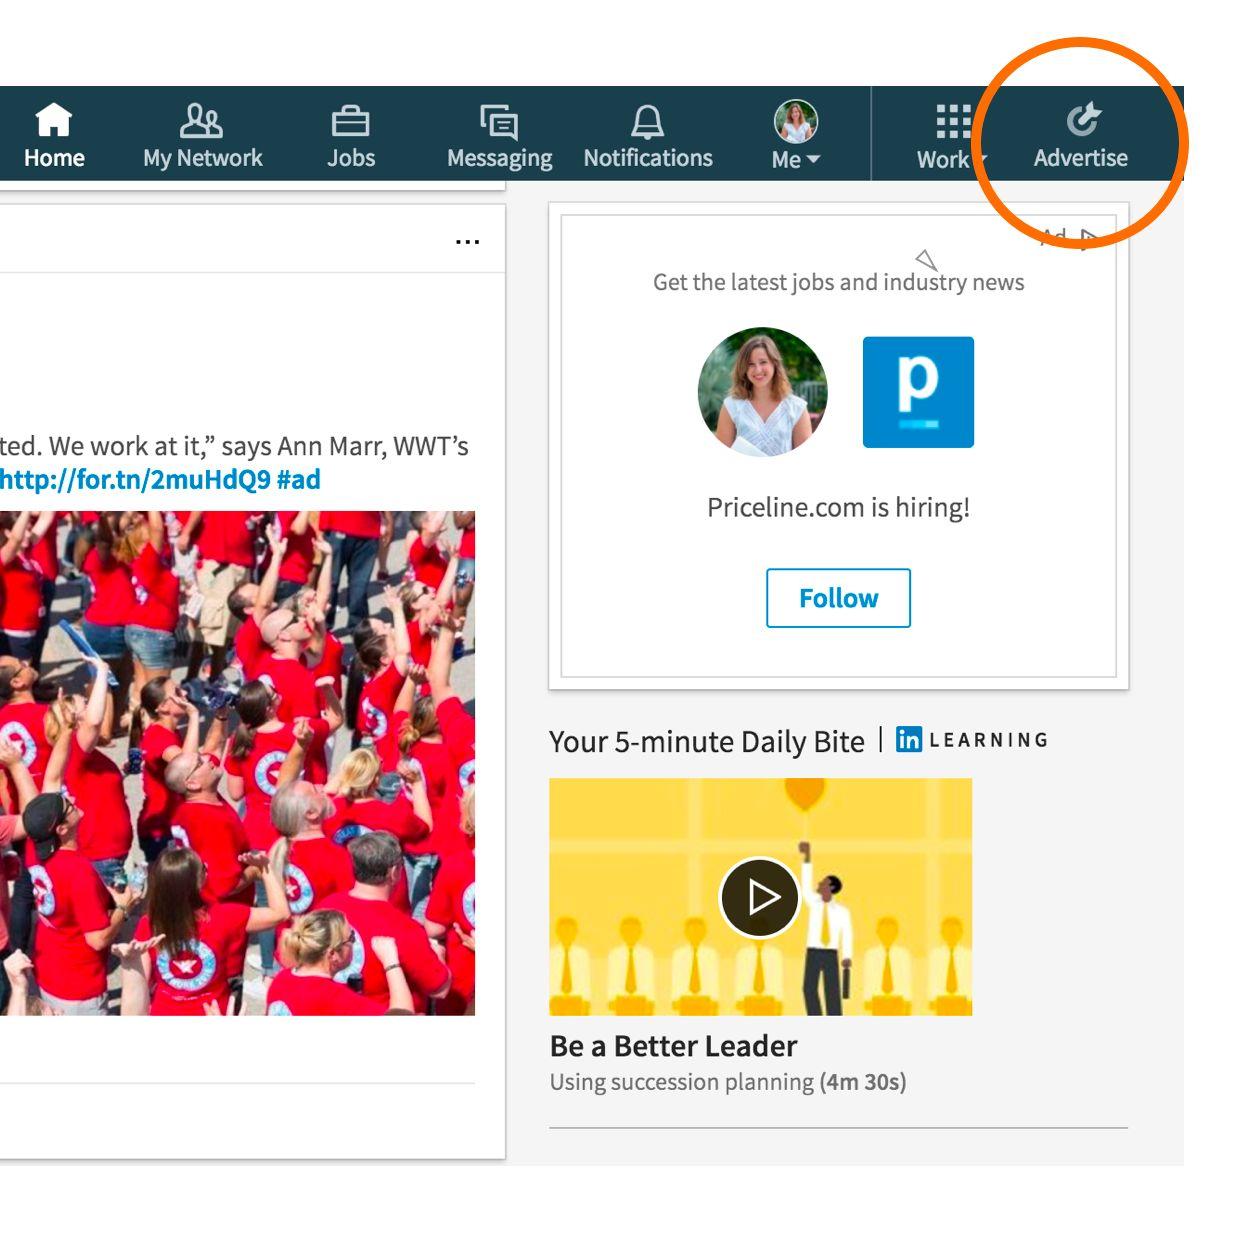 LinkedIn Advertise